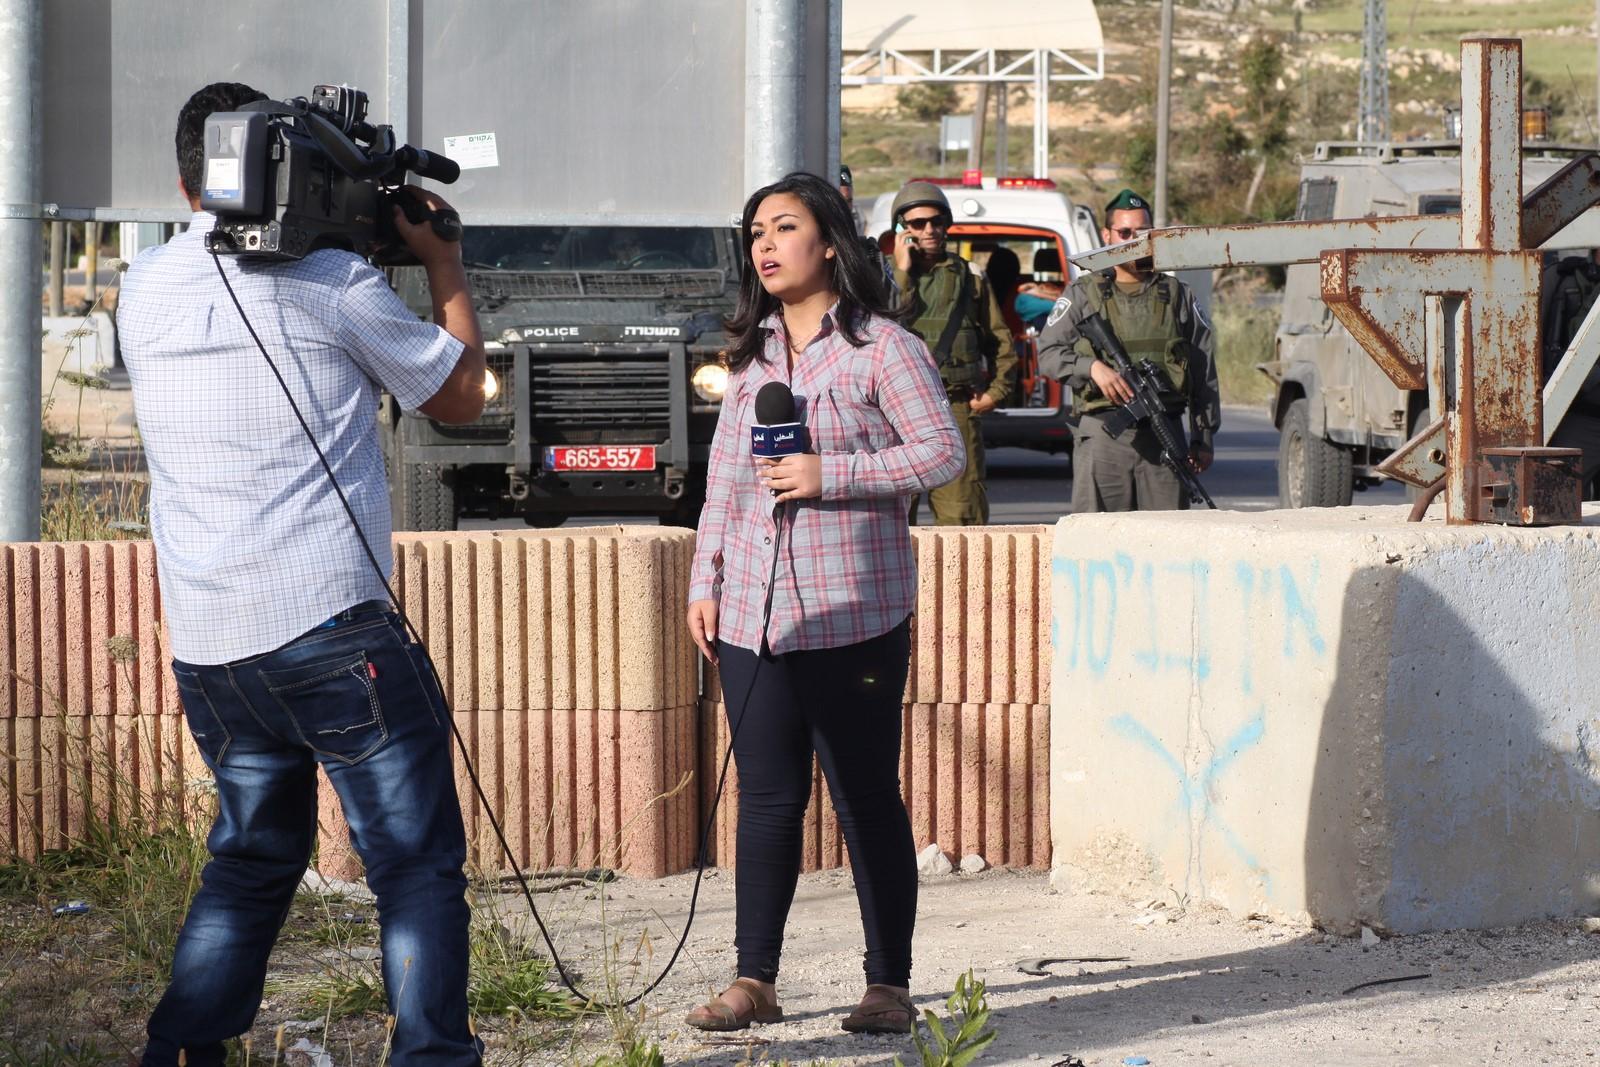 Palestinian journalists near Ramallah (Photo: Al Ittihad)